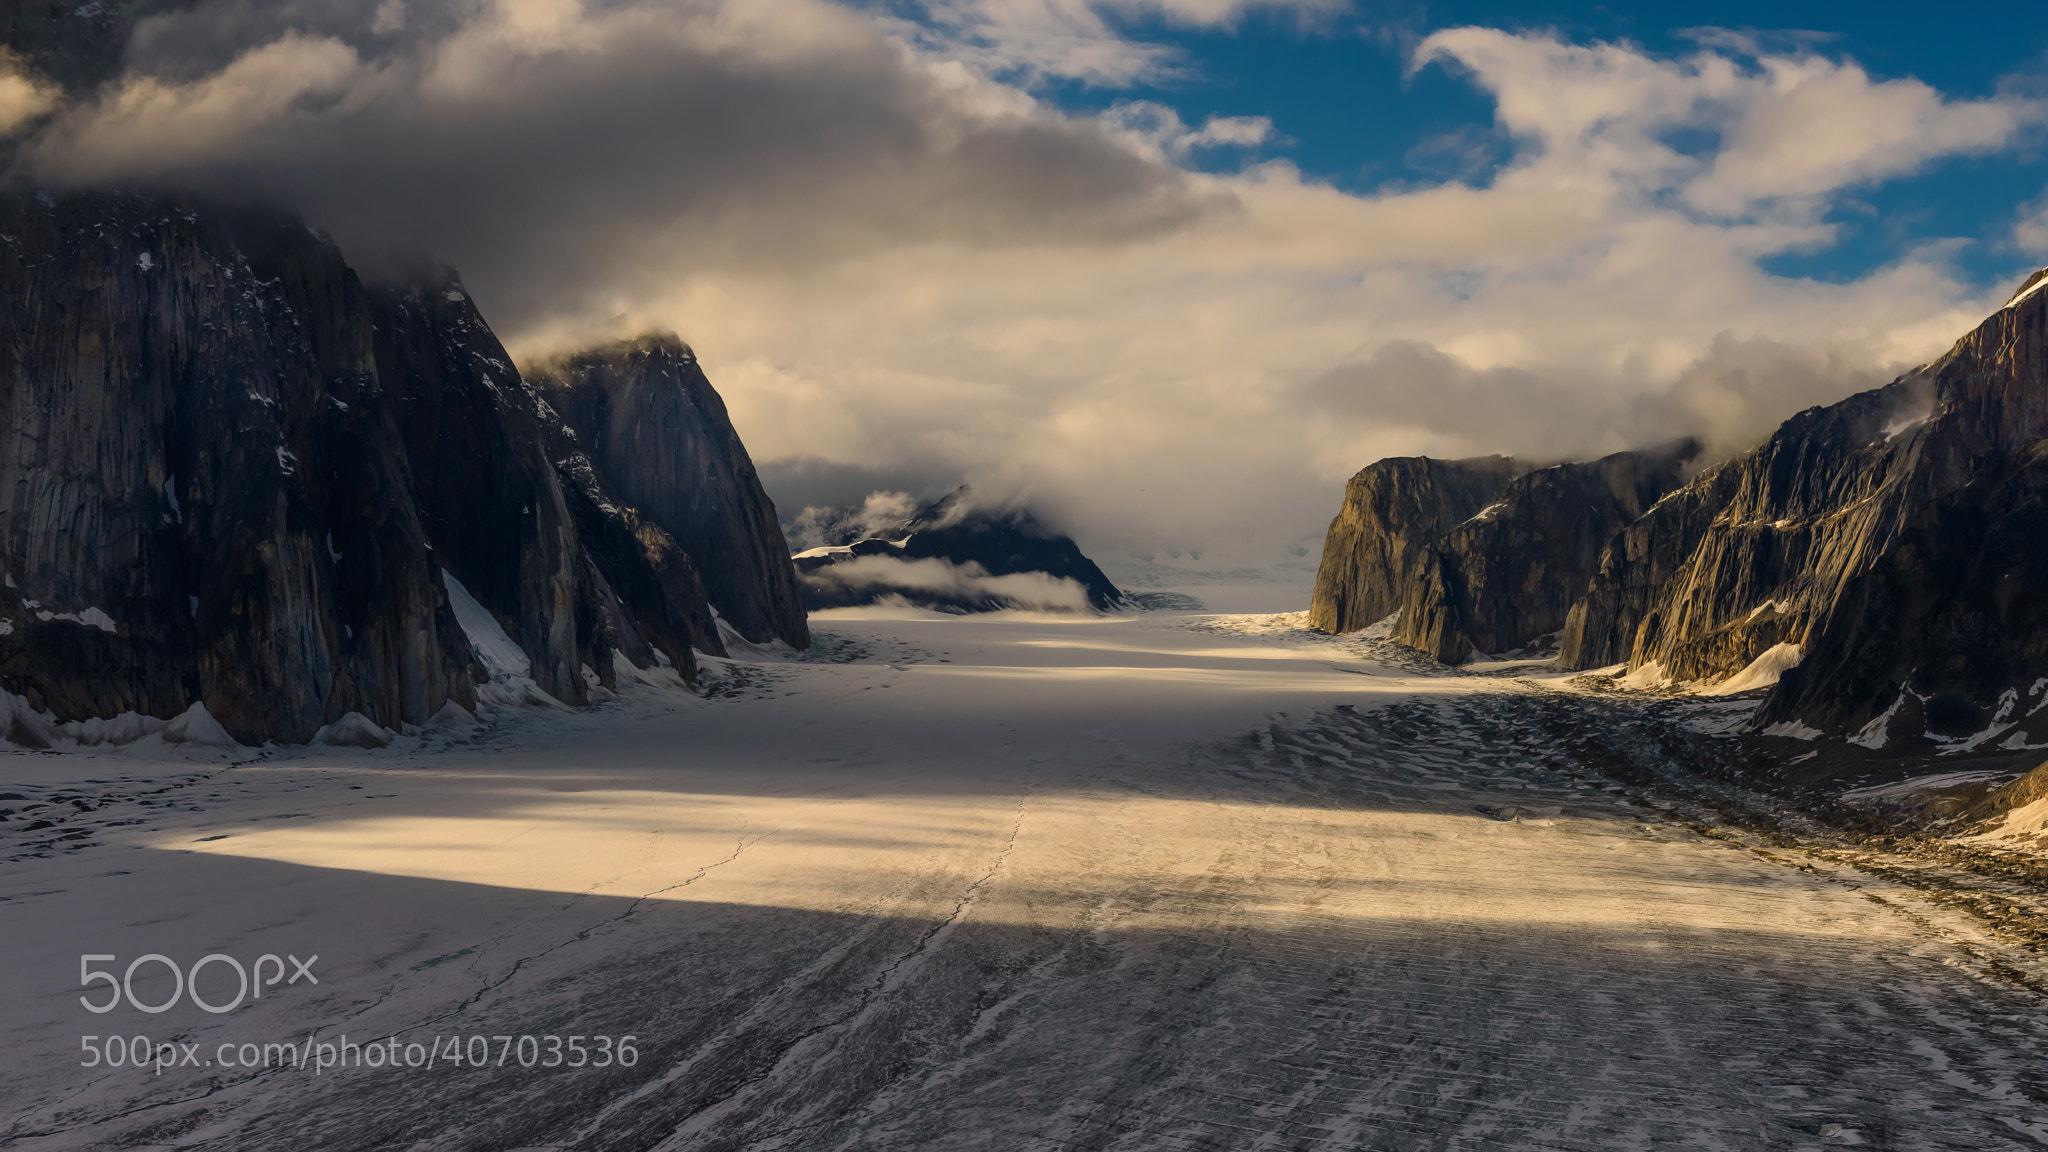 Photograph Glacier Valley by Evgeny Tchebotarev on 500px